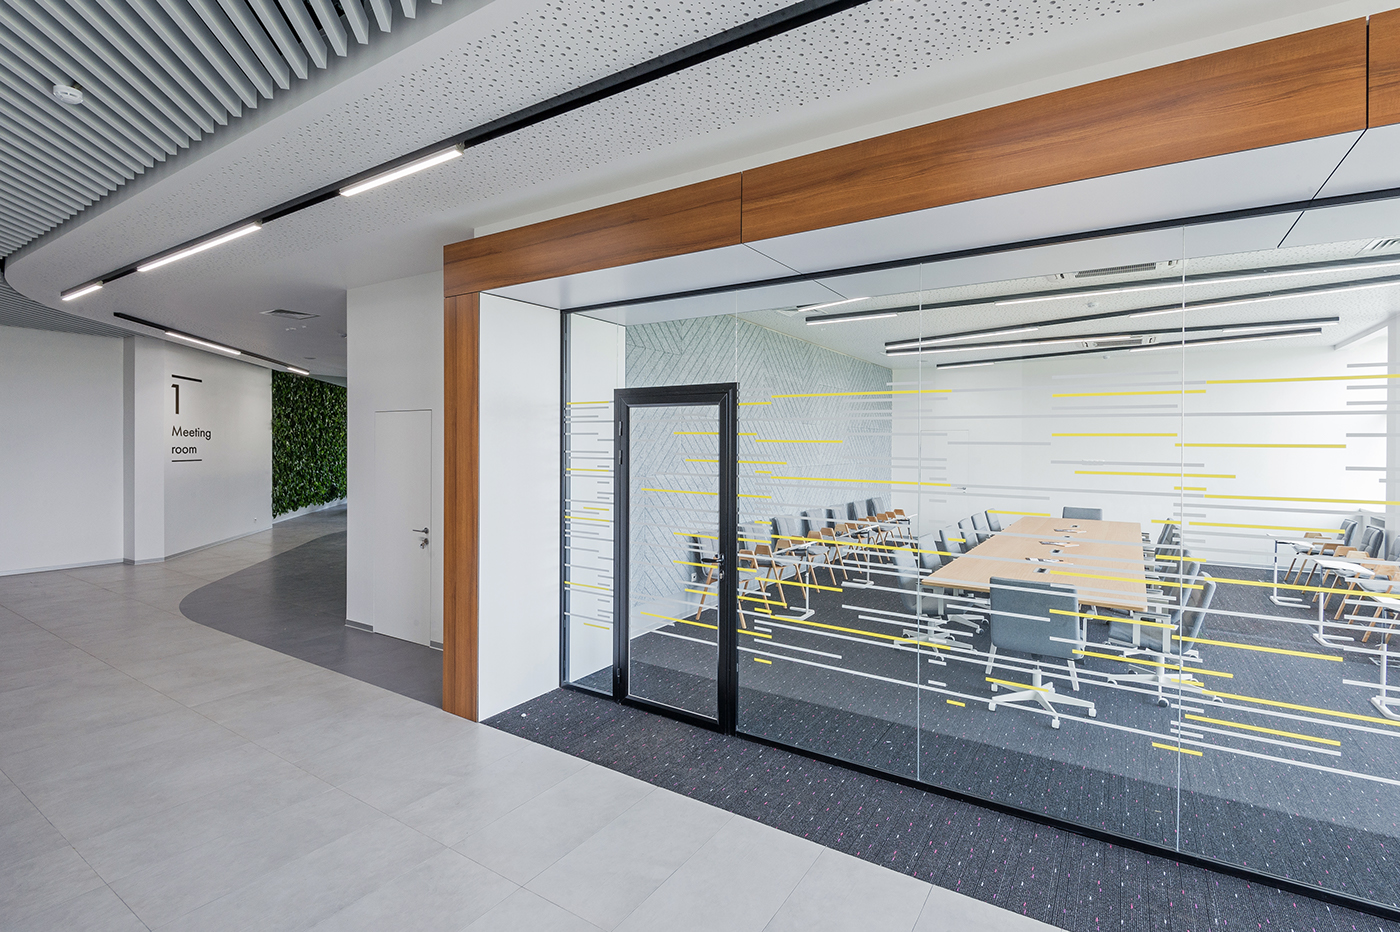 public space meeting room contemporary architectural interior portal eco-friendly recycled materials Общественные пространства переговорные